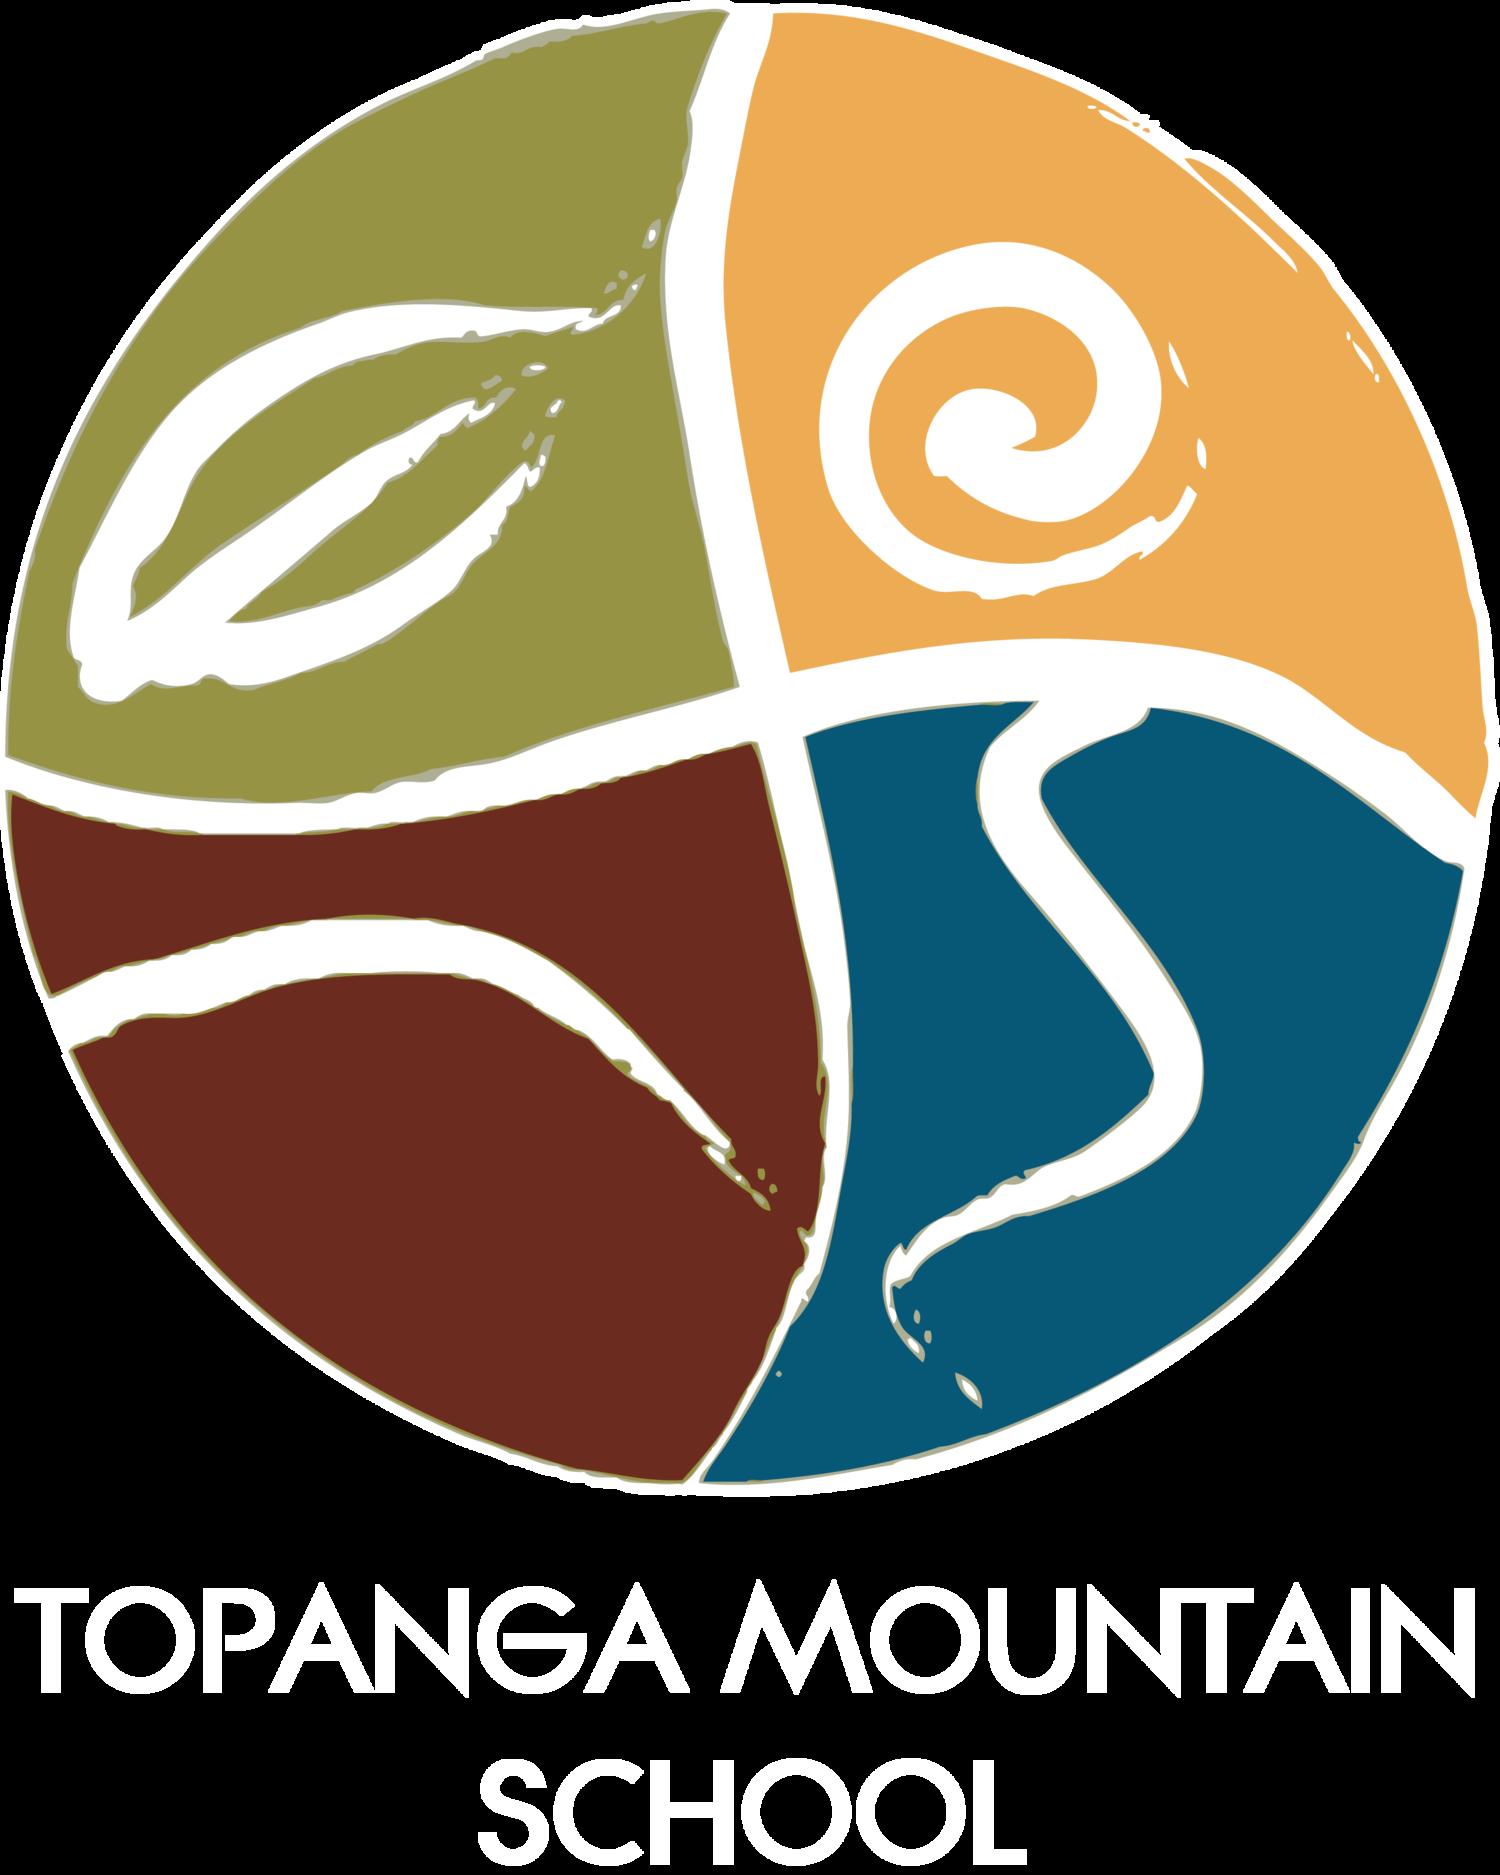 Topanga school . Woodland clipart mountain